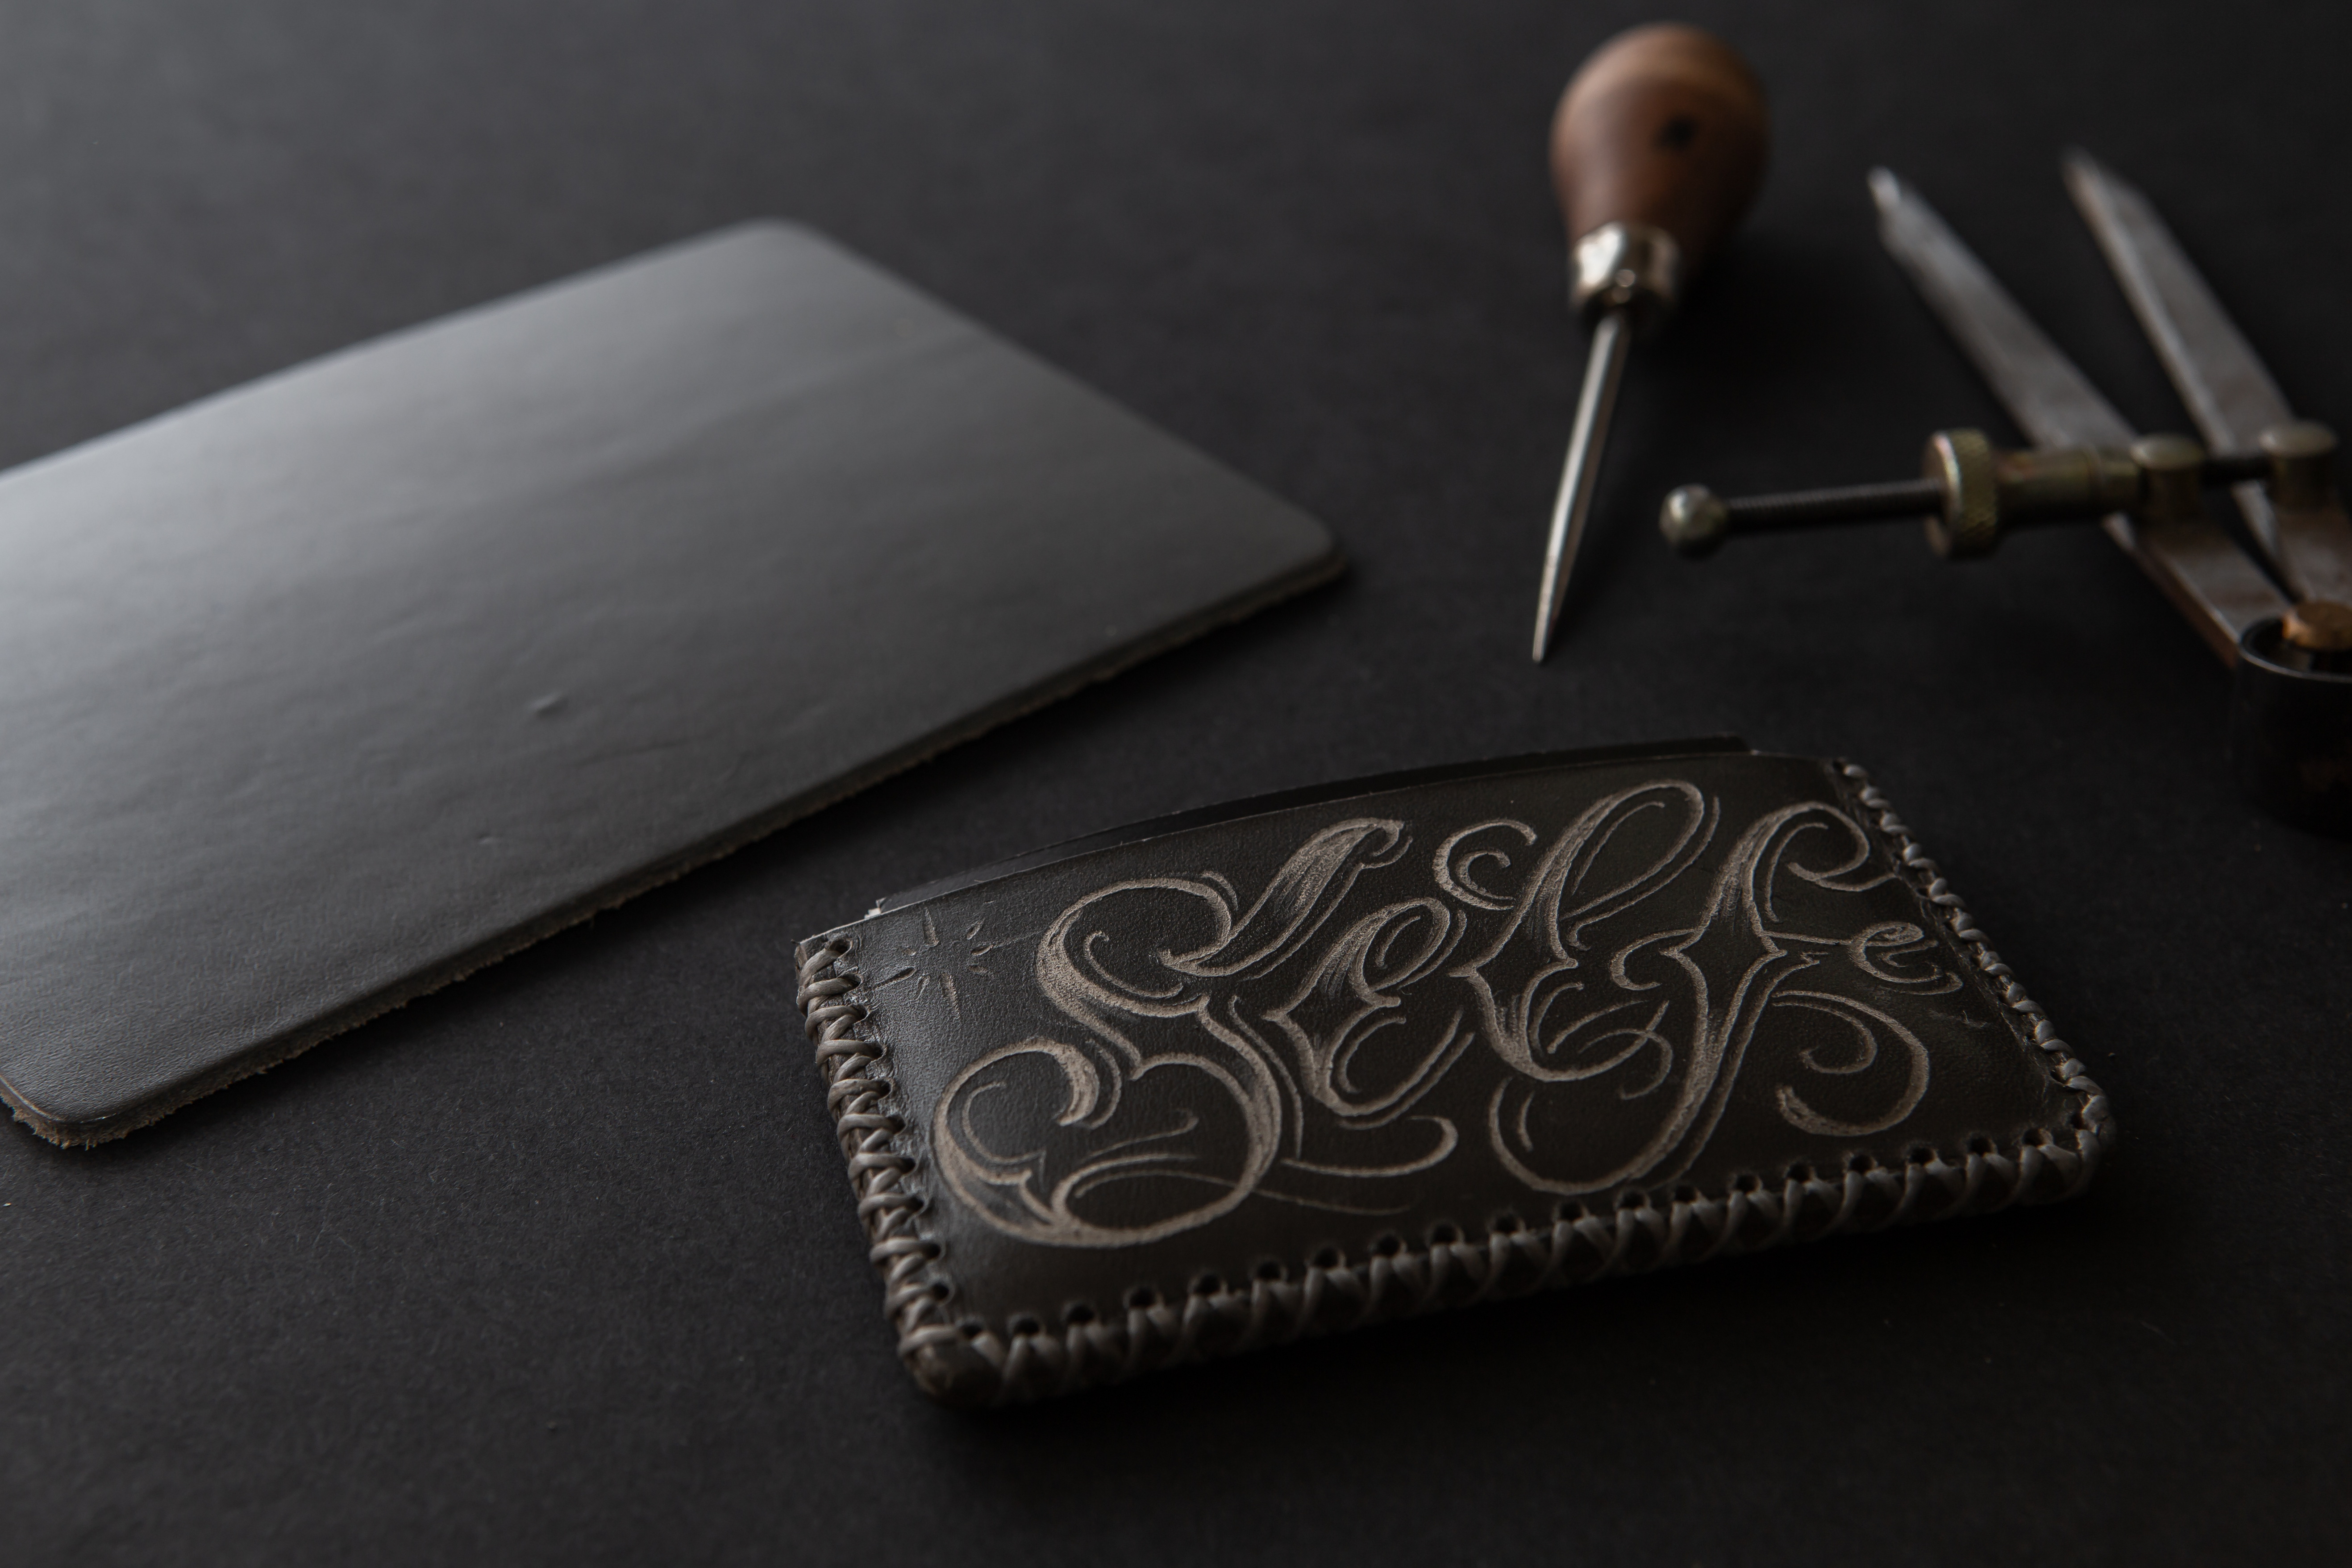 Artisan-Jean Ewen-Graveur sur cuir